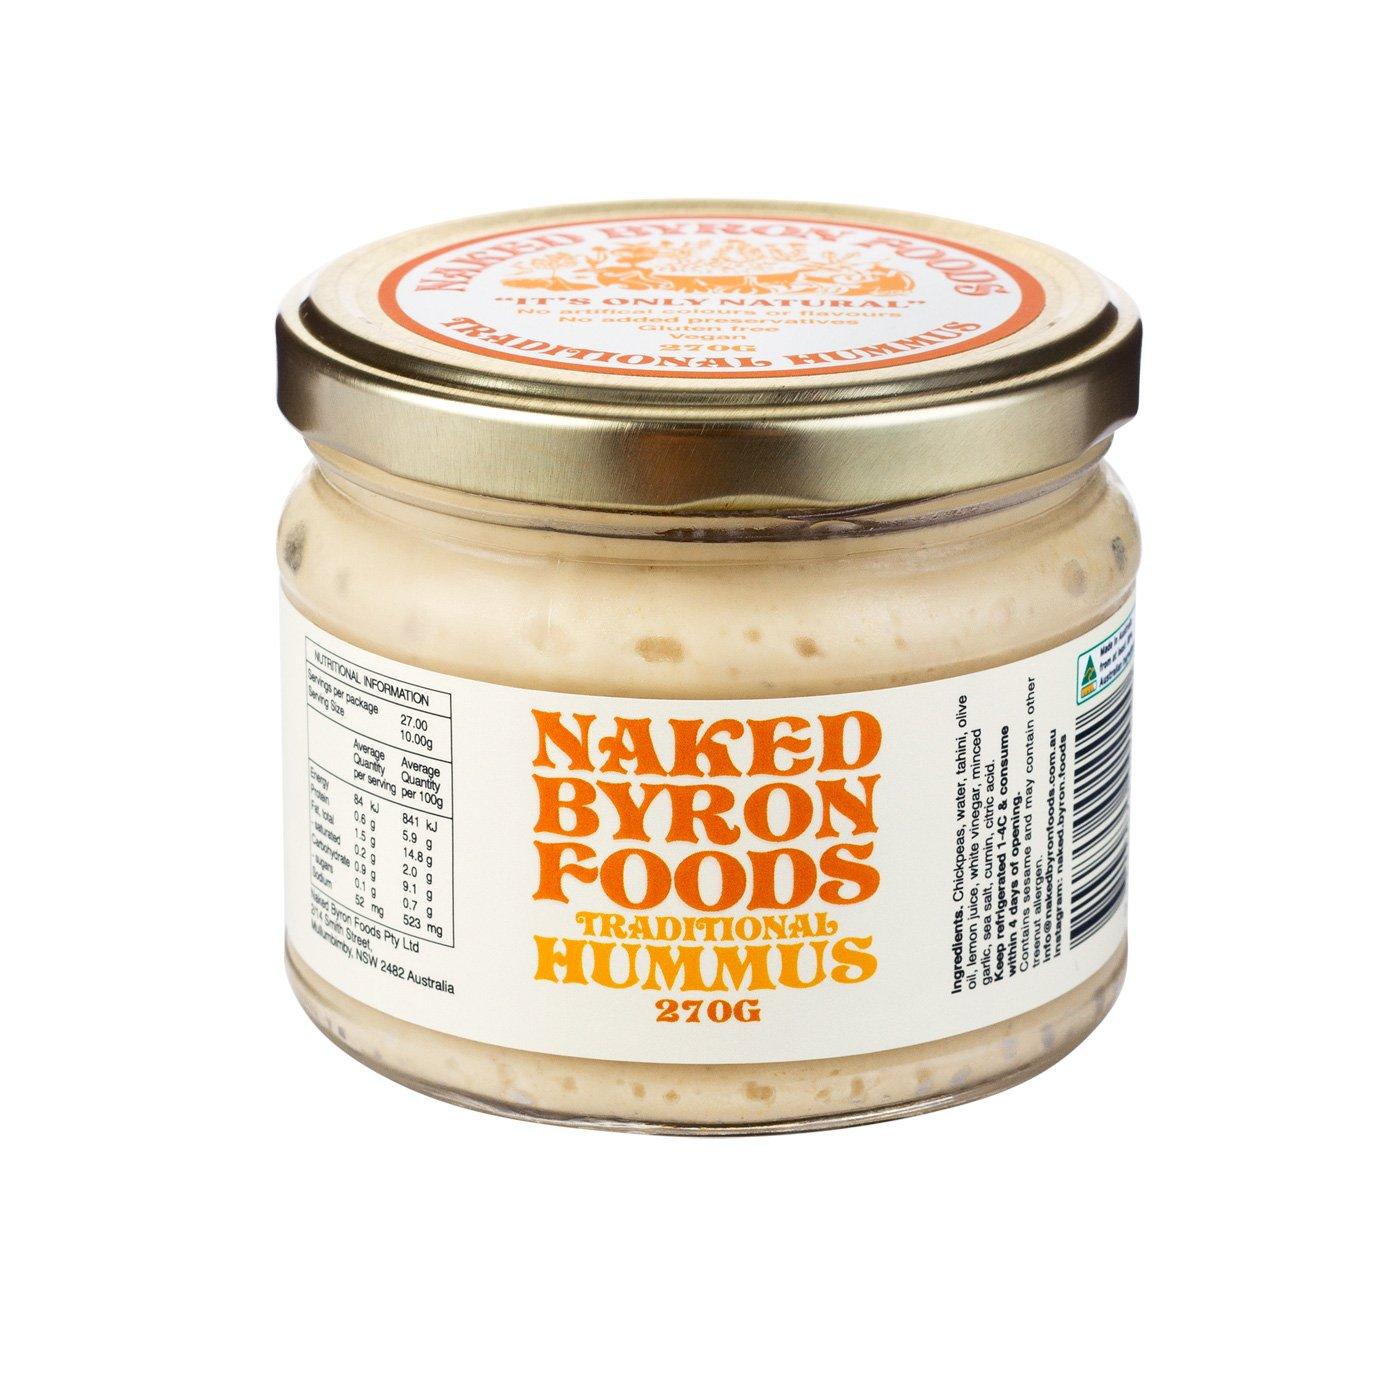 Naked Byron - *NEW* Zaatar Hummus 270g x 6 (Carton